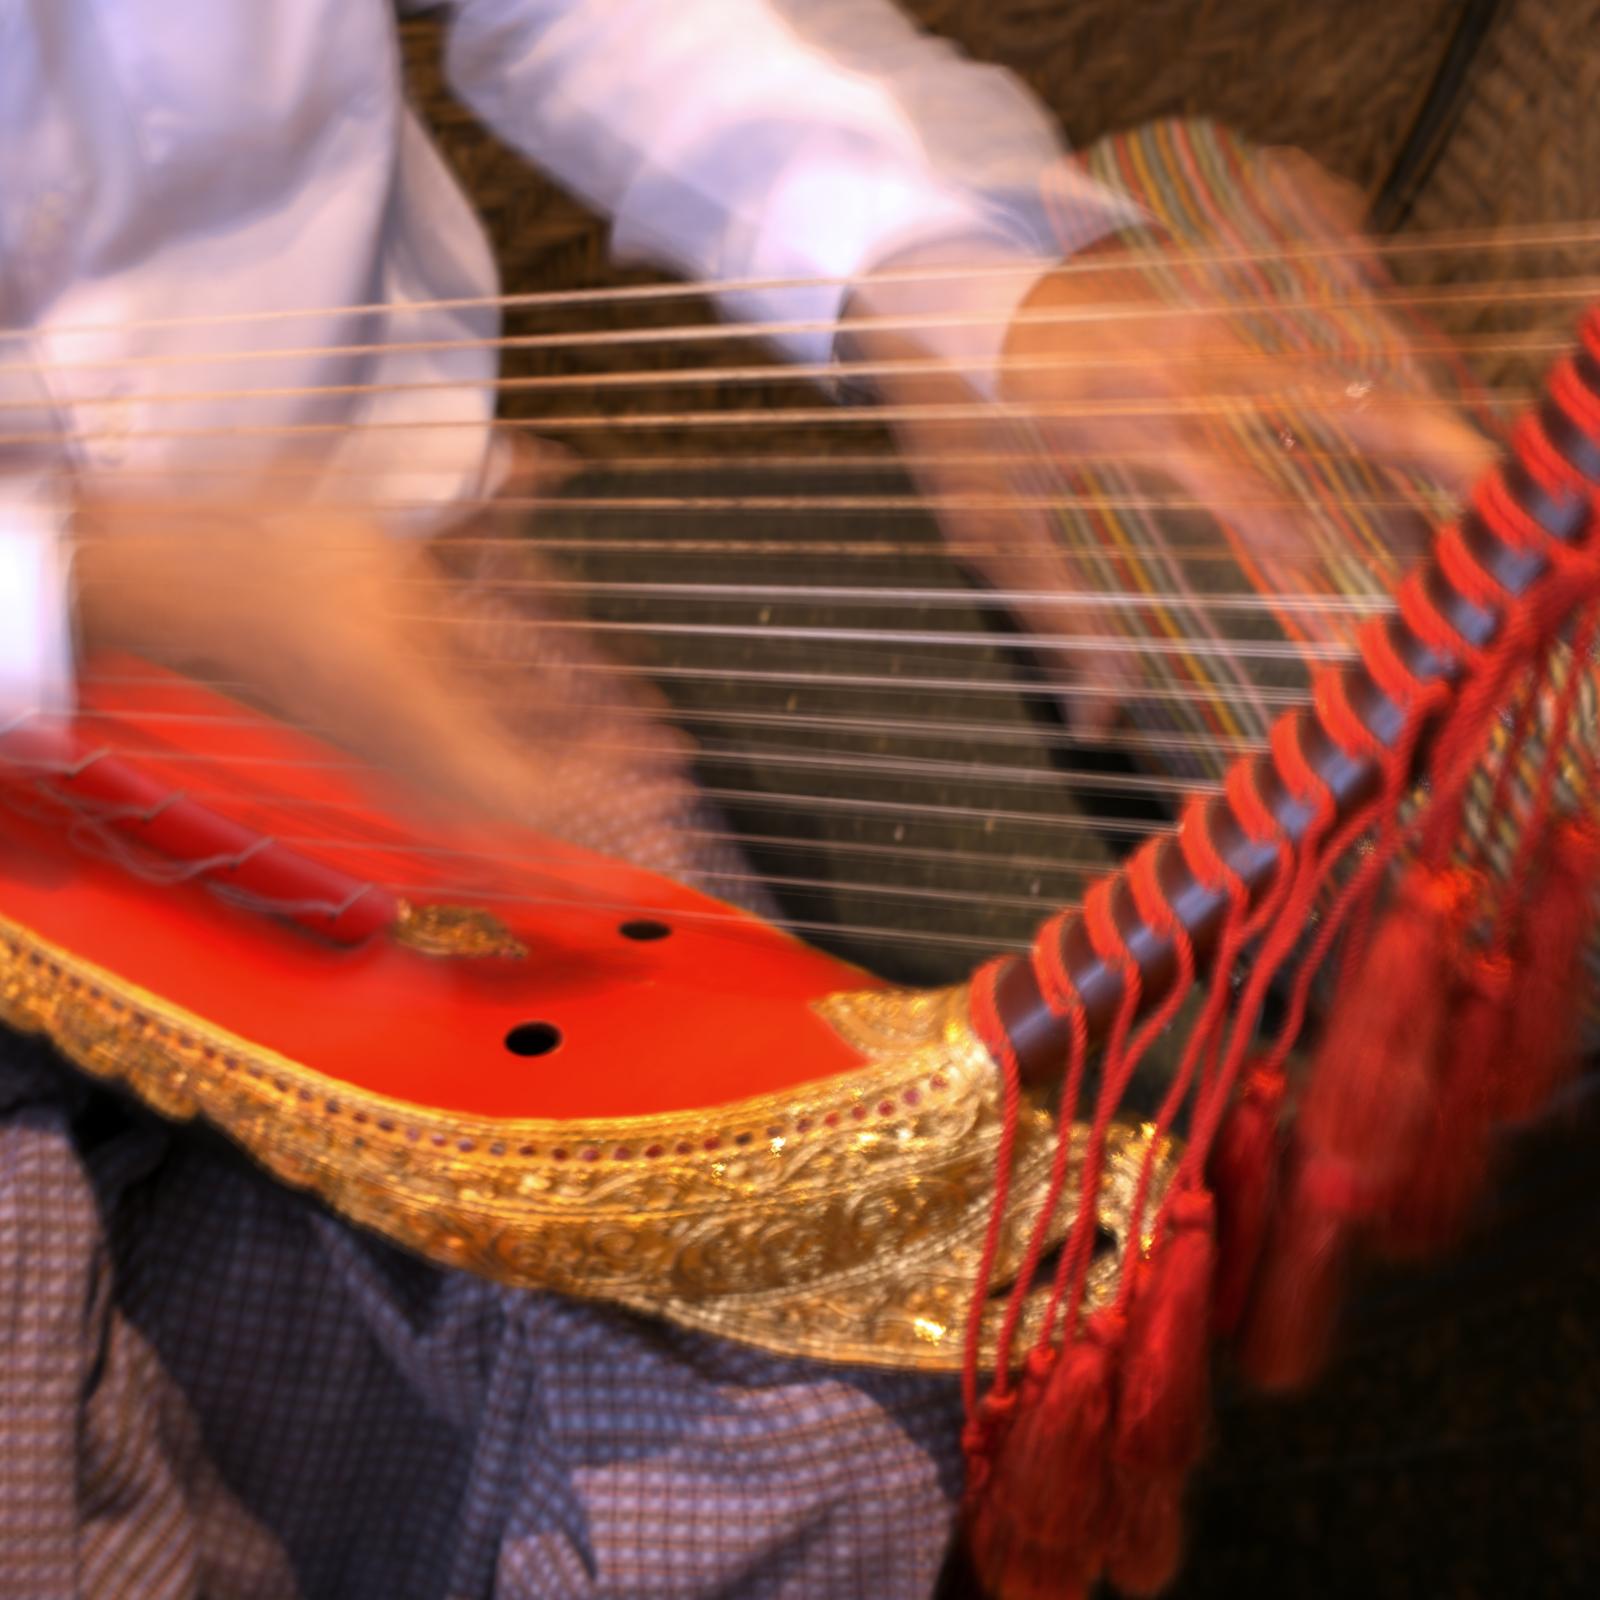 harp 3.jpeg